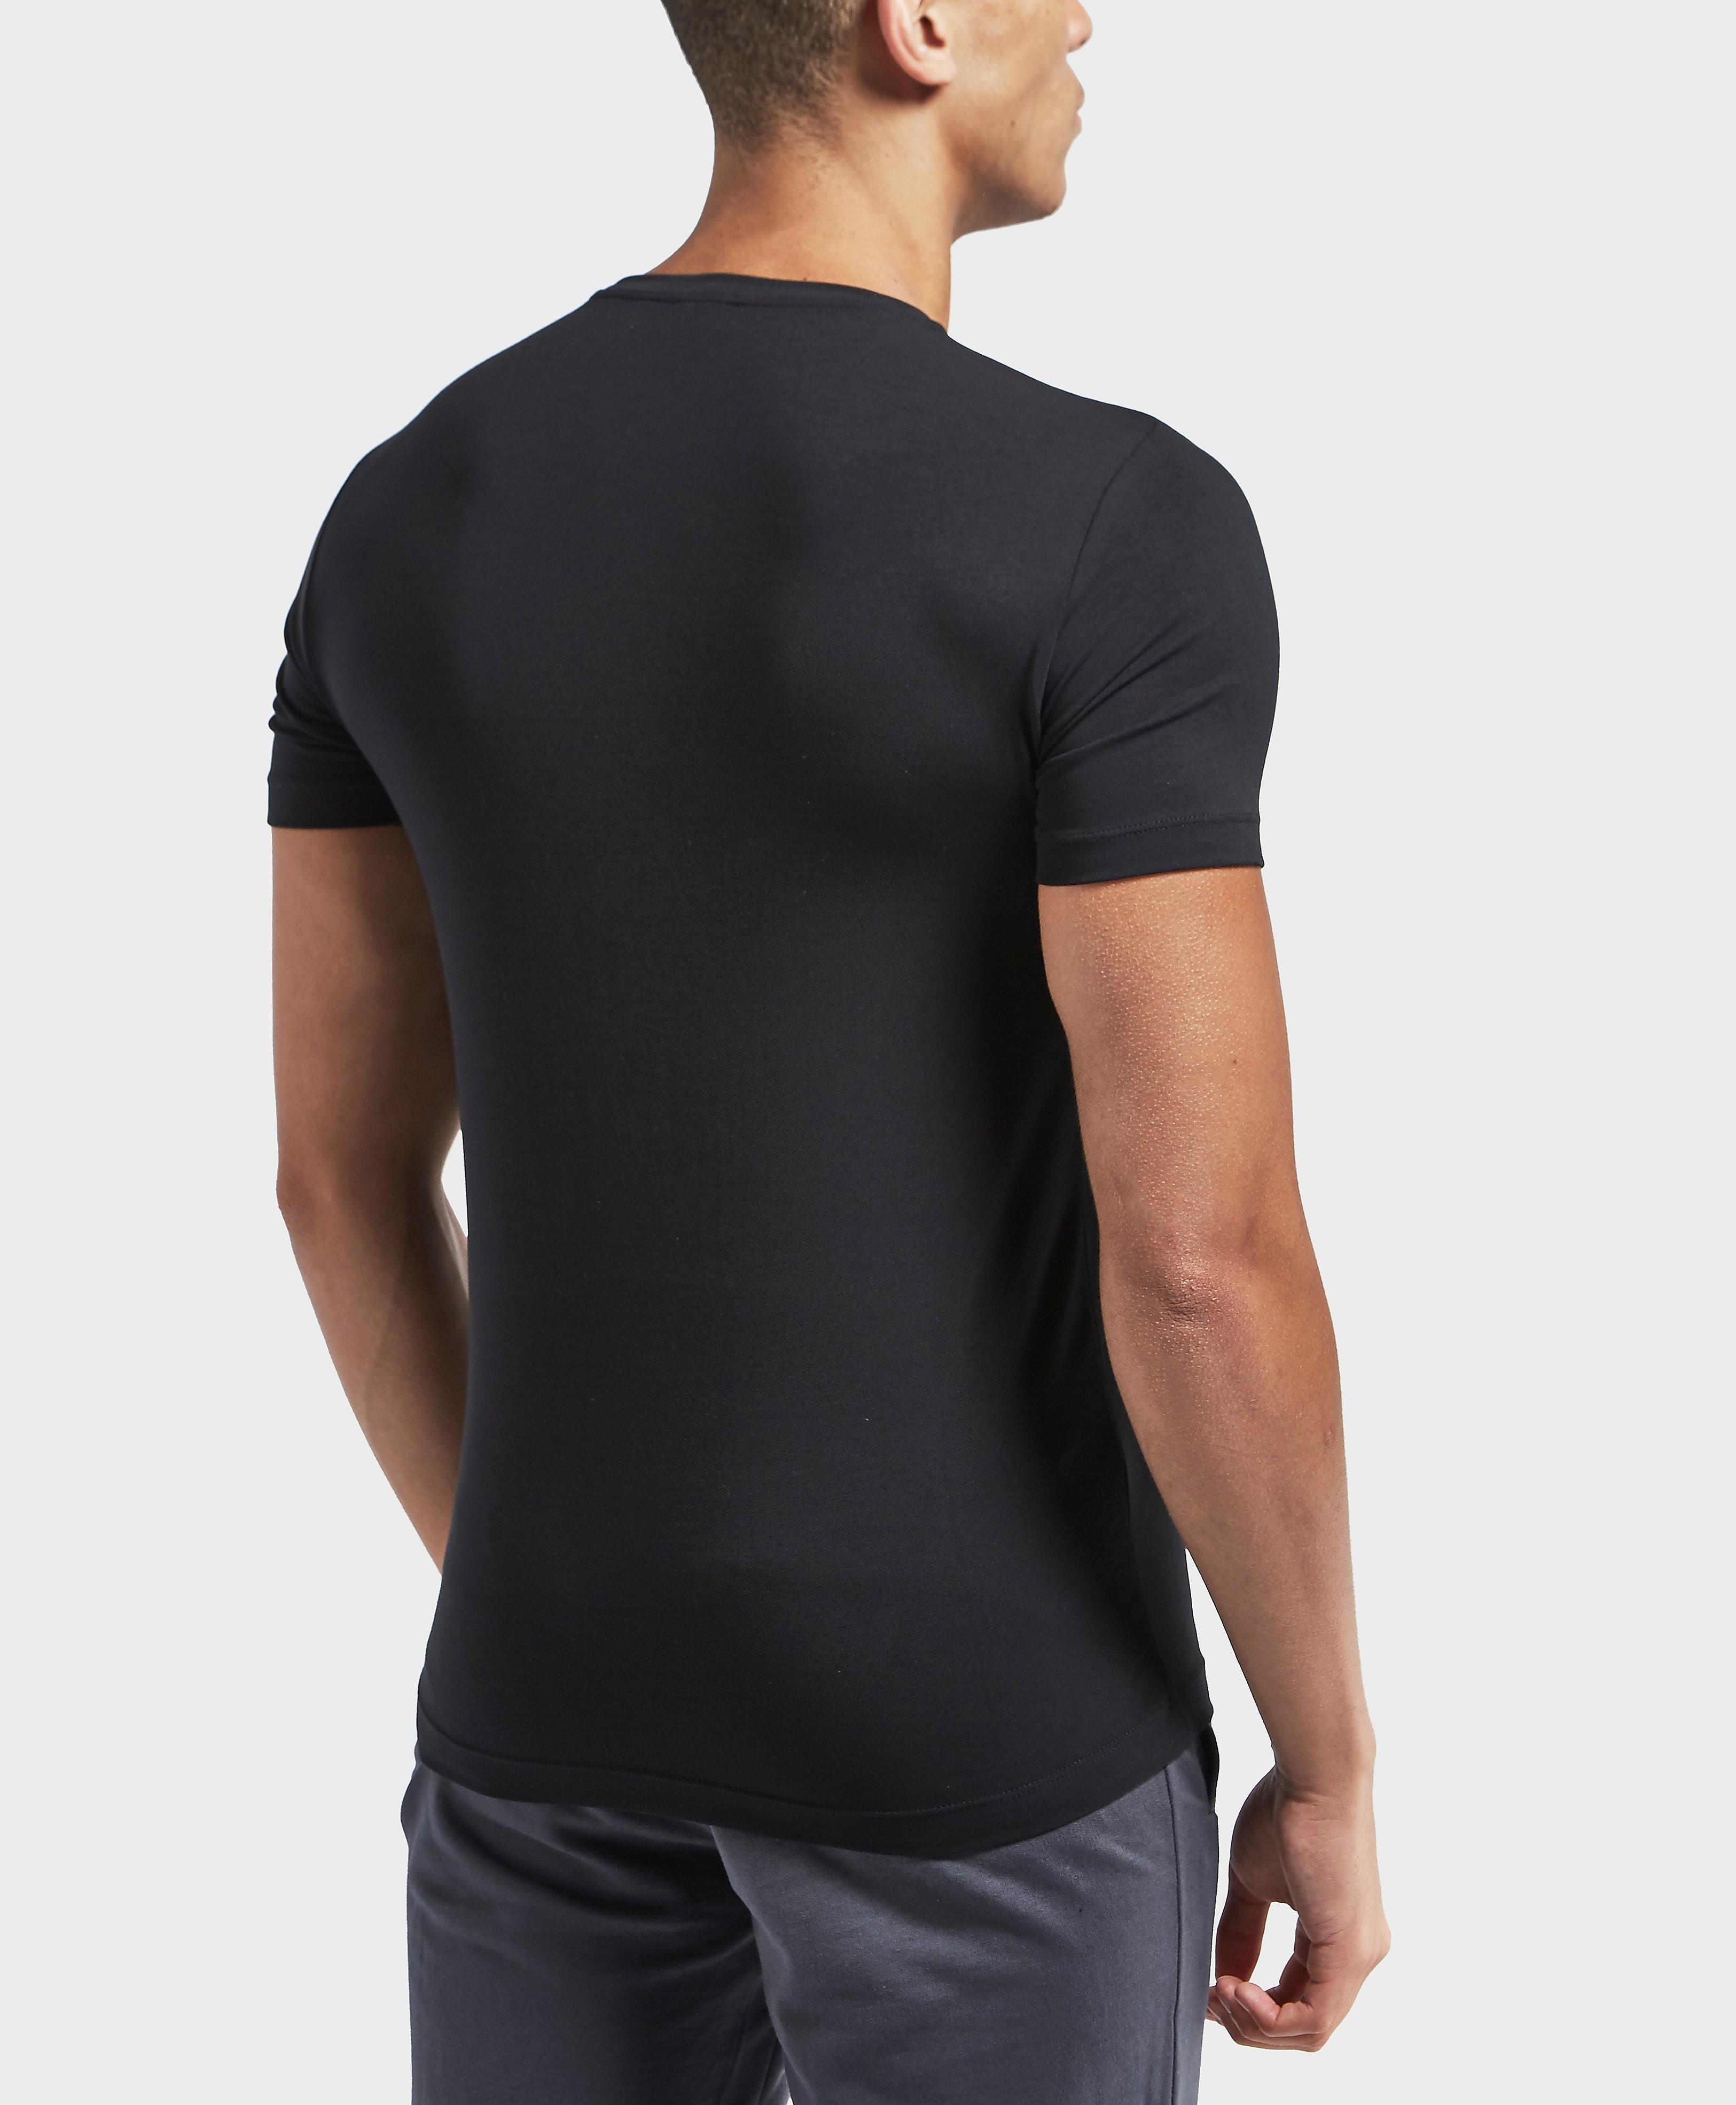 Emporio Armani EA7 Shield Short Sleeve Crew T-Shirt